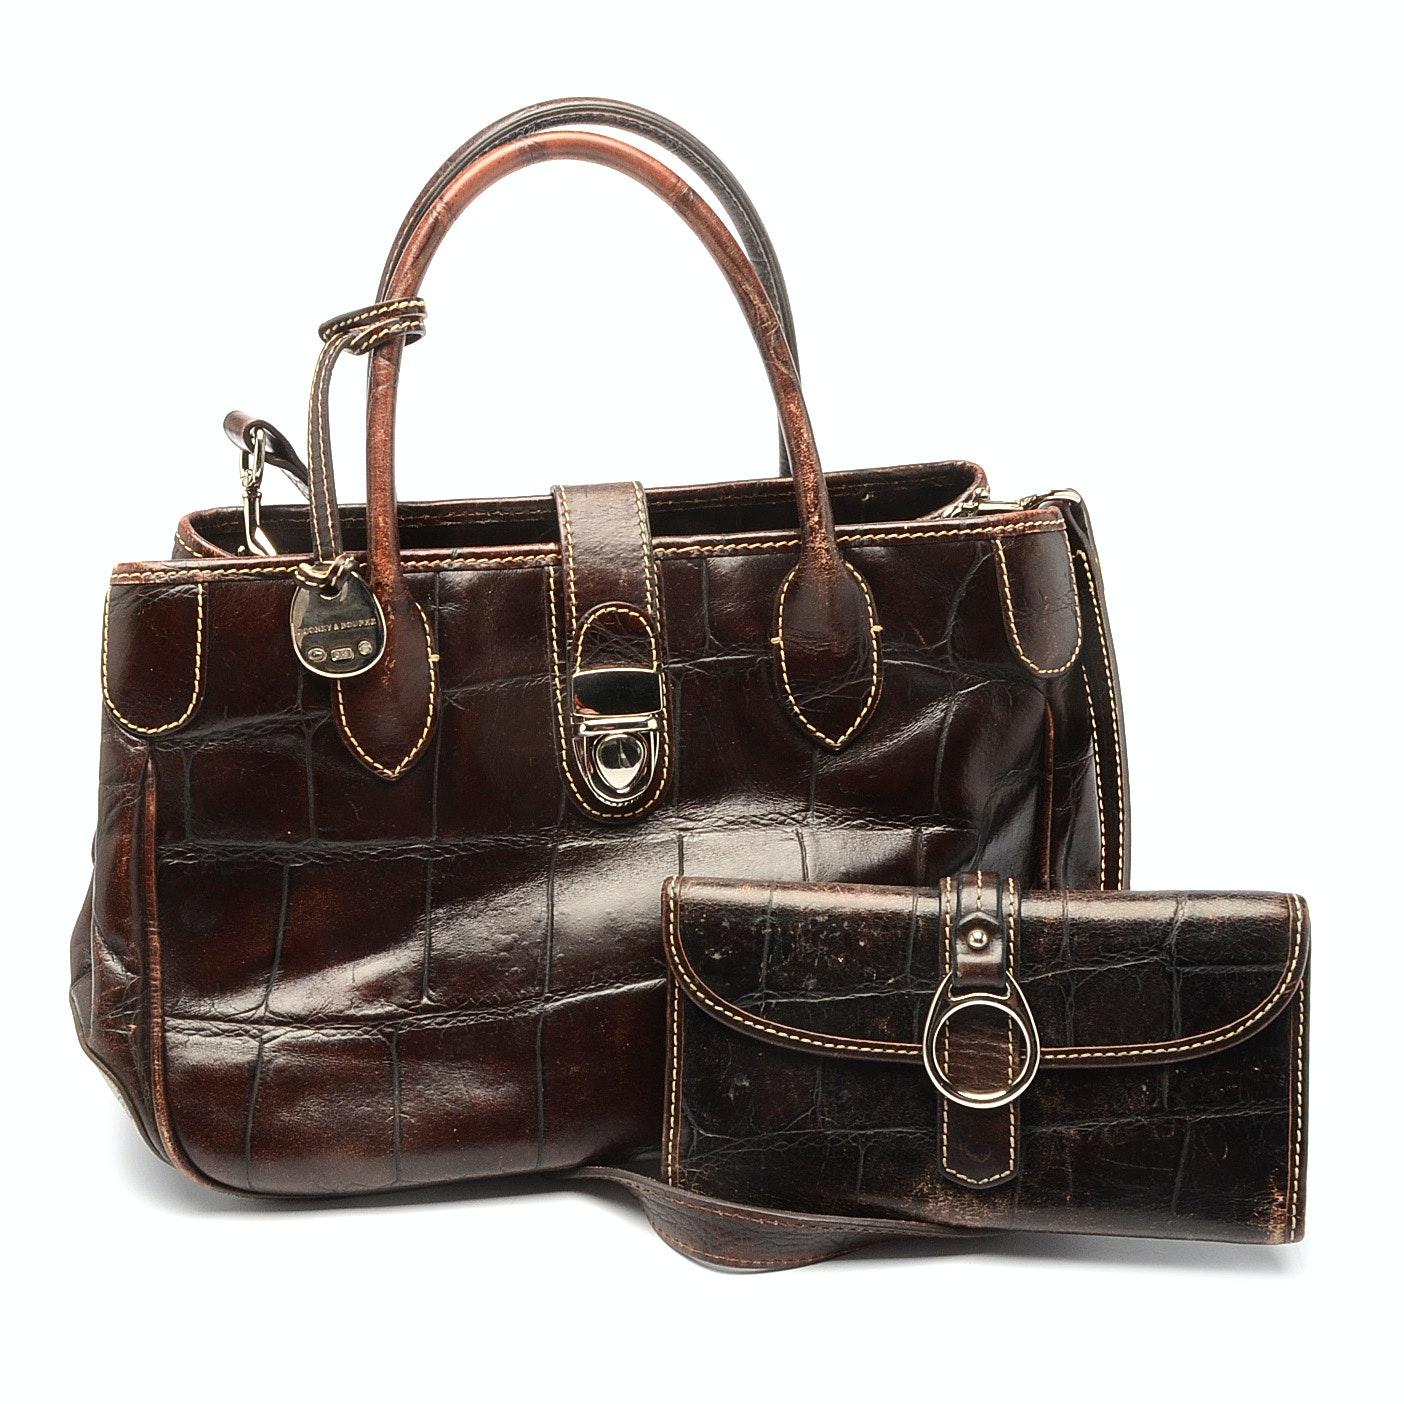 Dooney & Bourke Embossed Leather Handbag and Matching Wallet